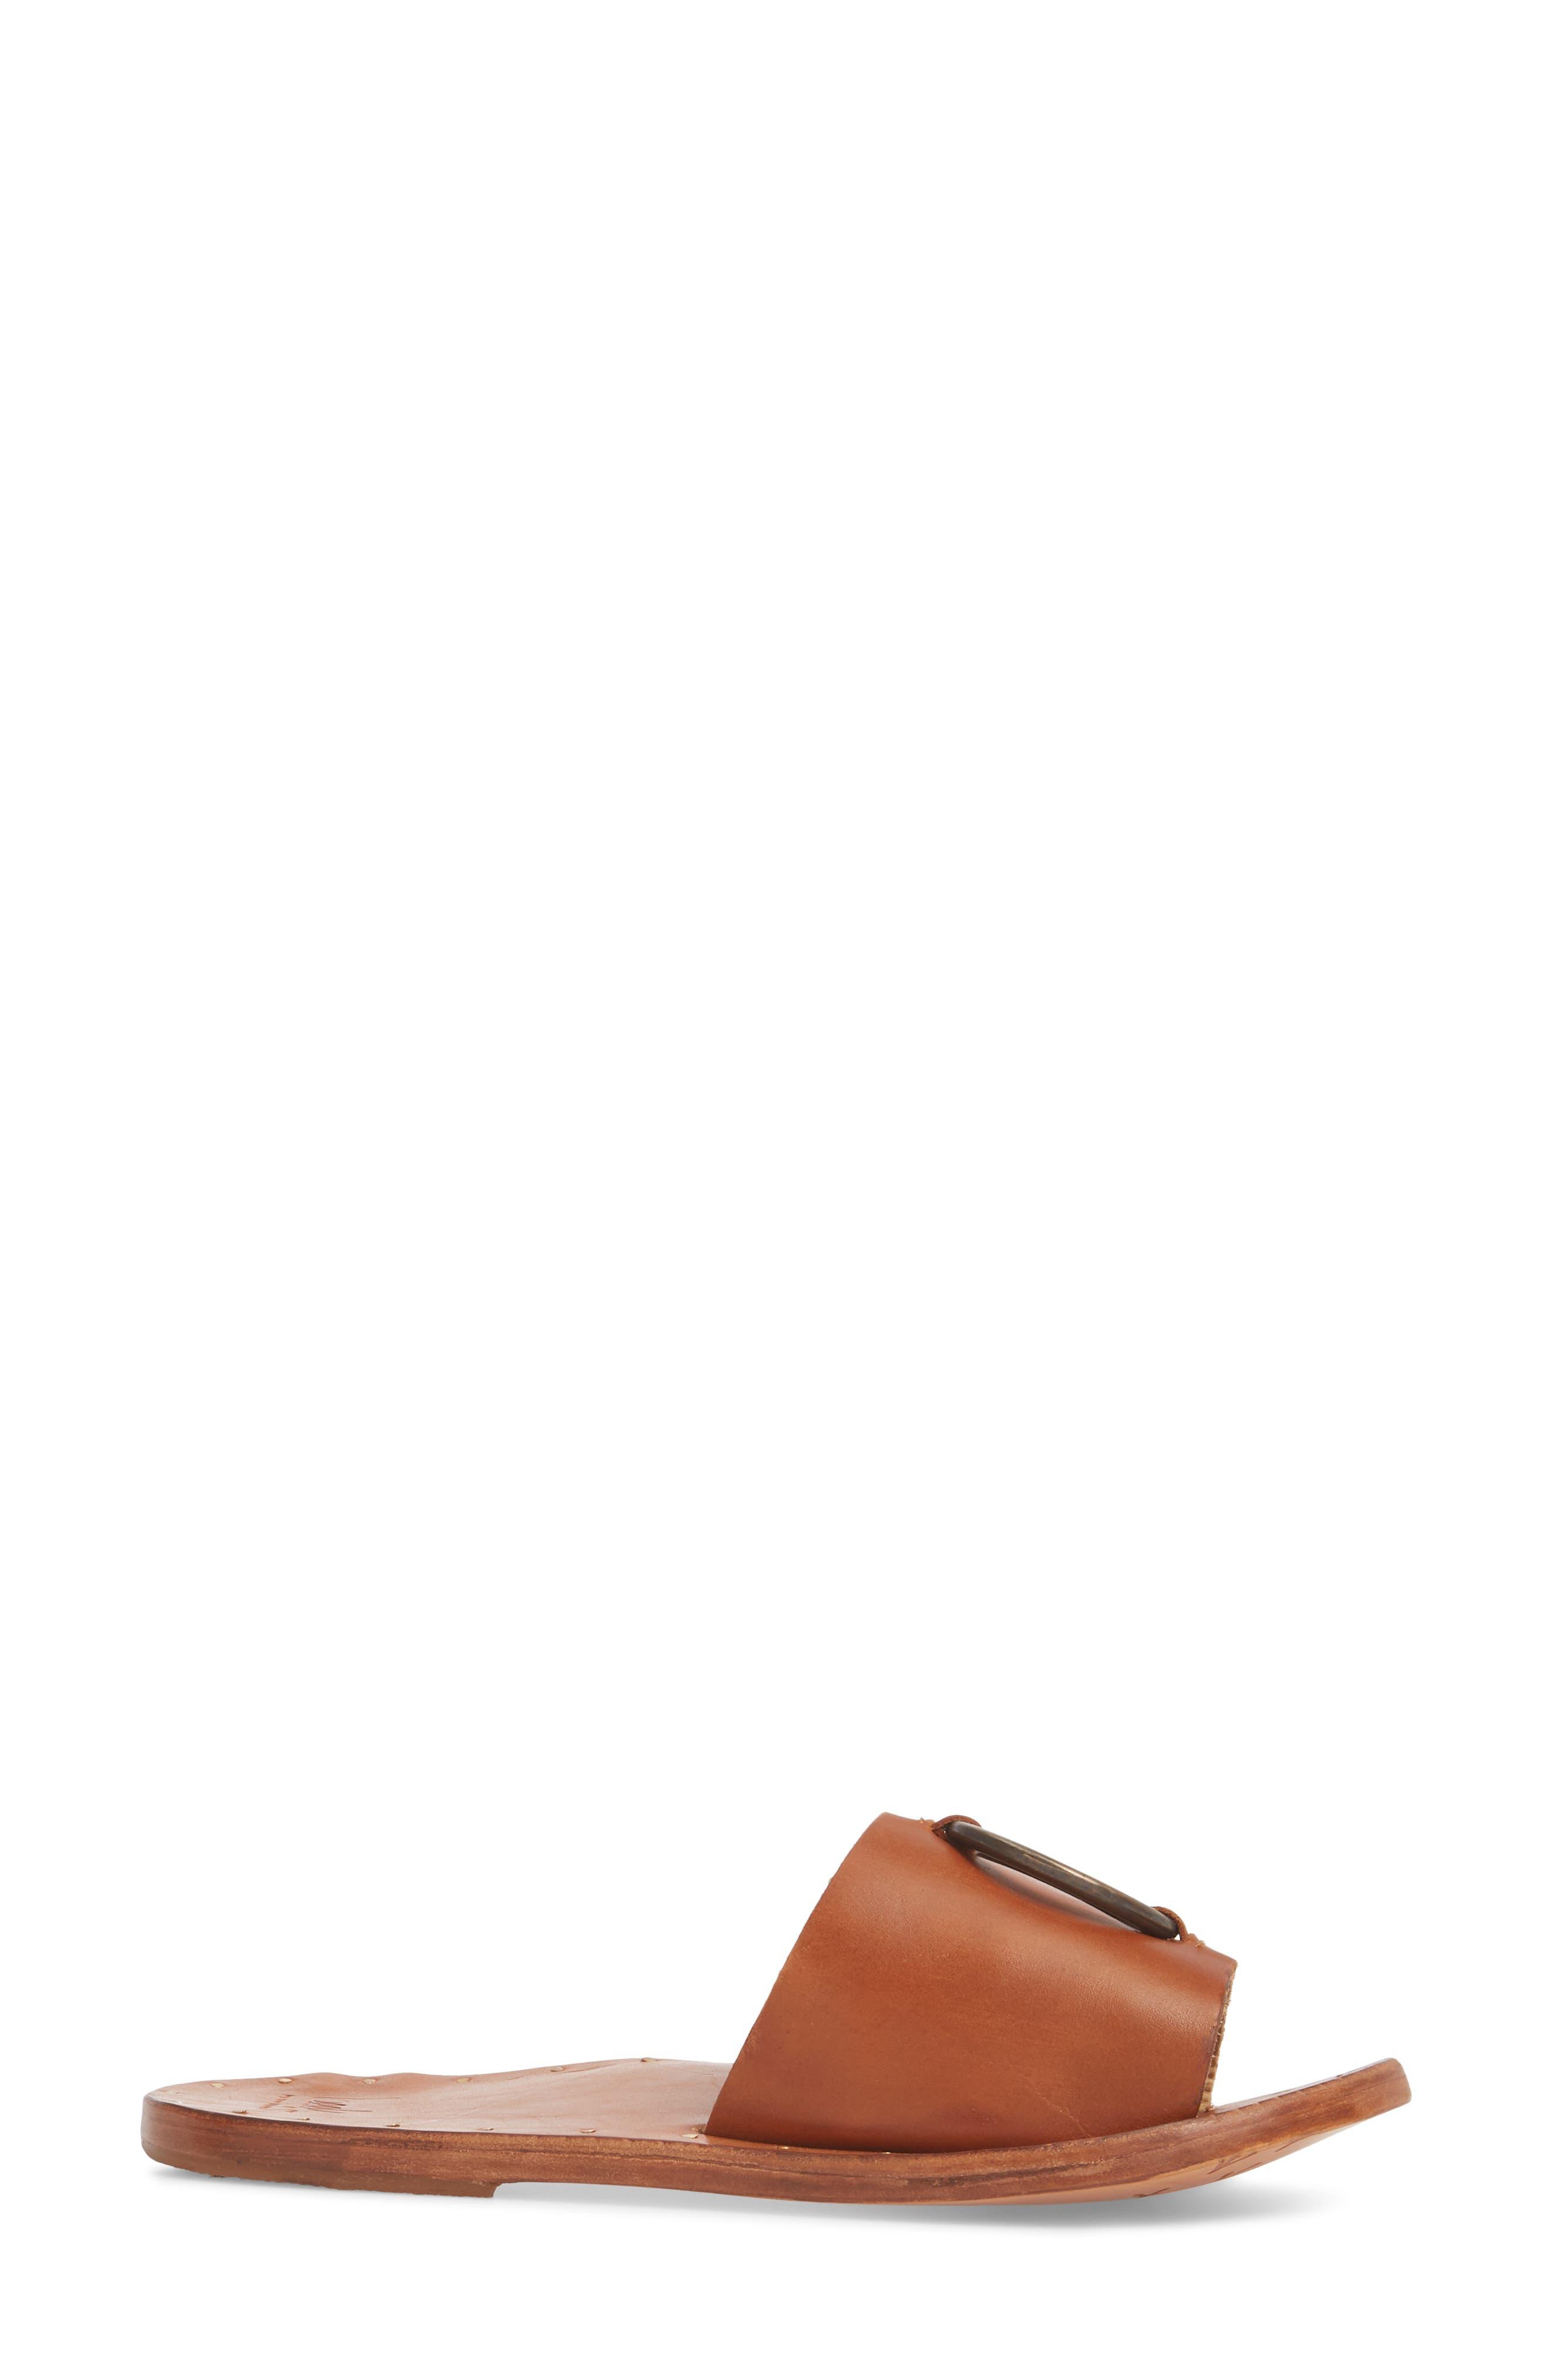 Cockatoo Slide Sandal,                             Alternate thumbnail 3, color,